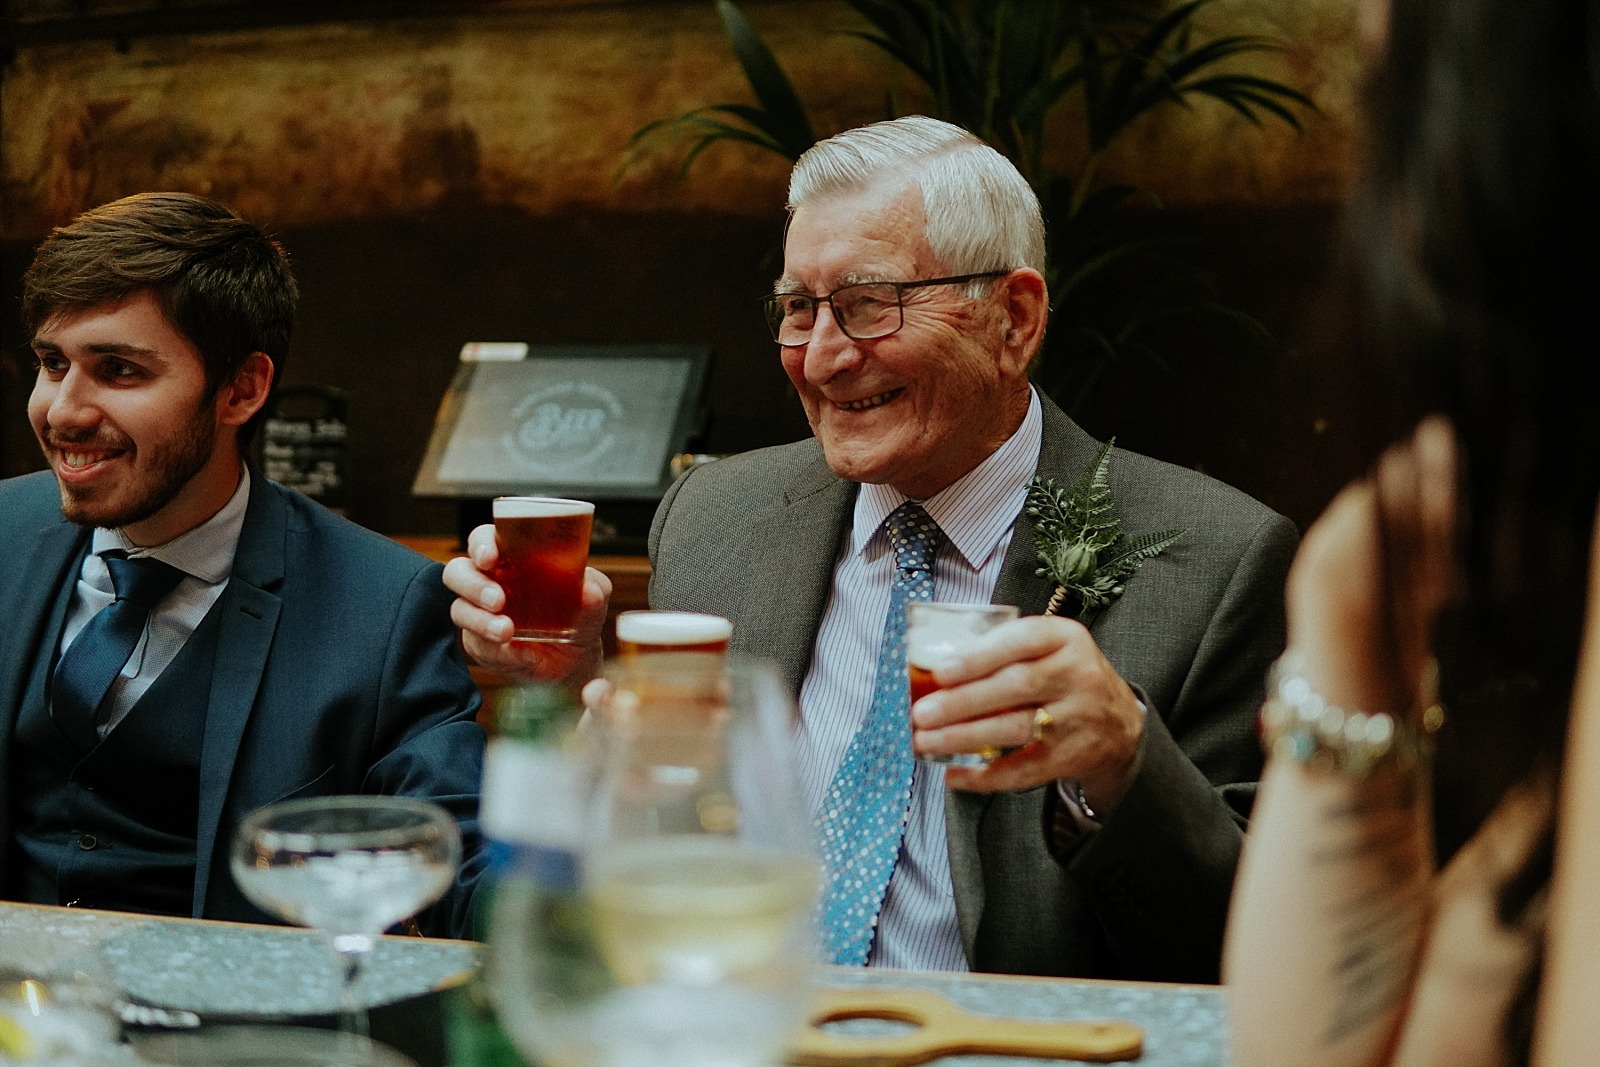 grandad holding up bowling beer